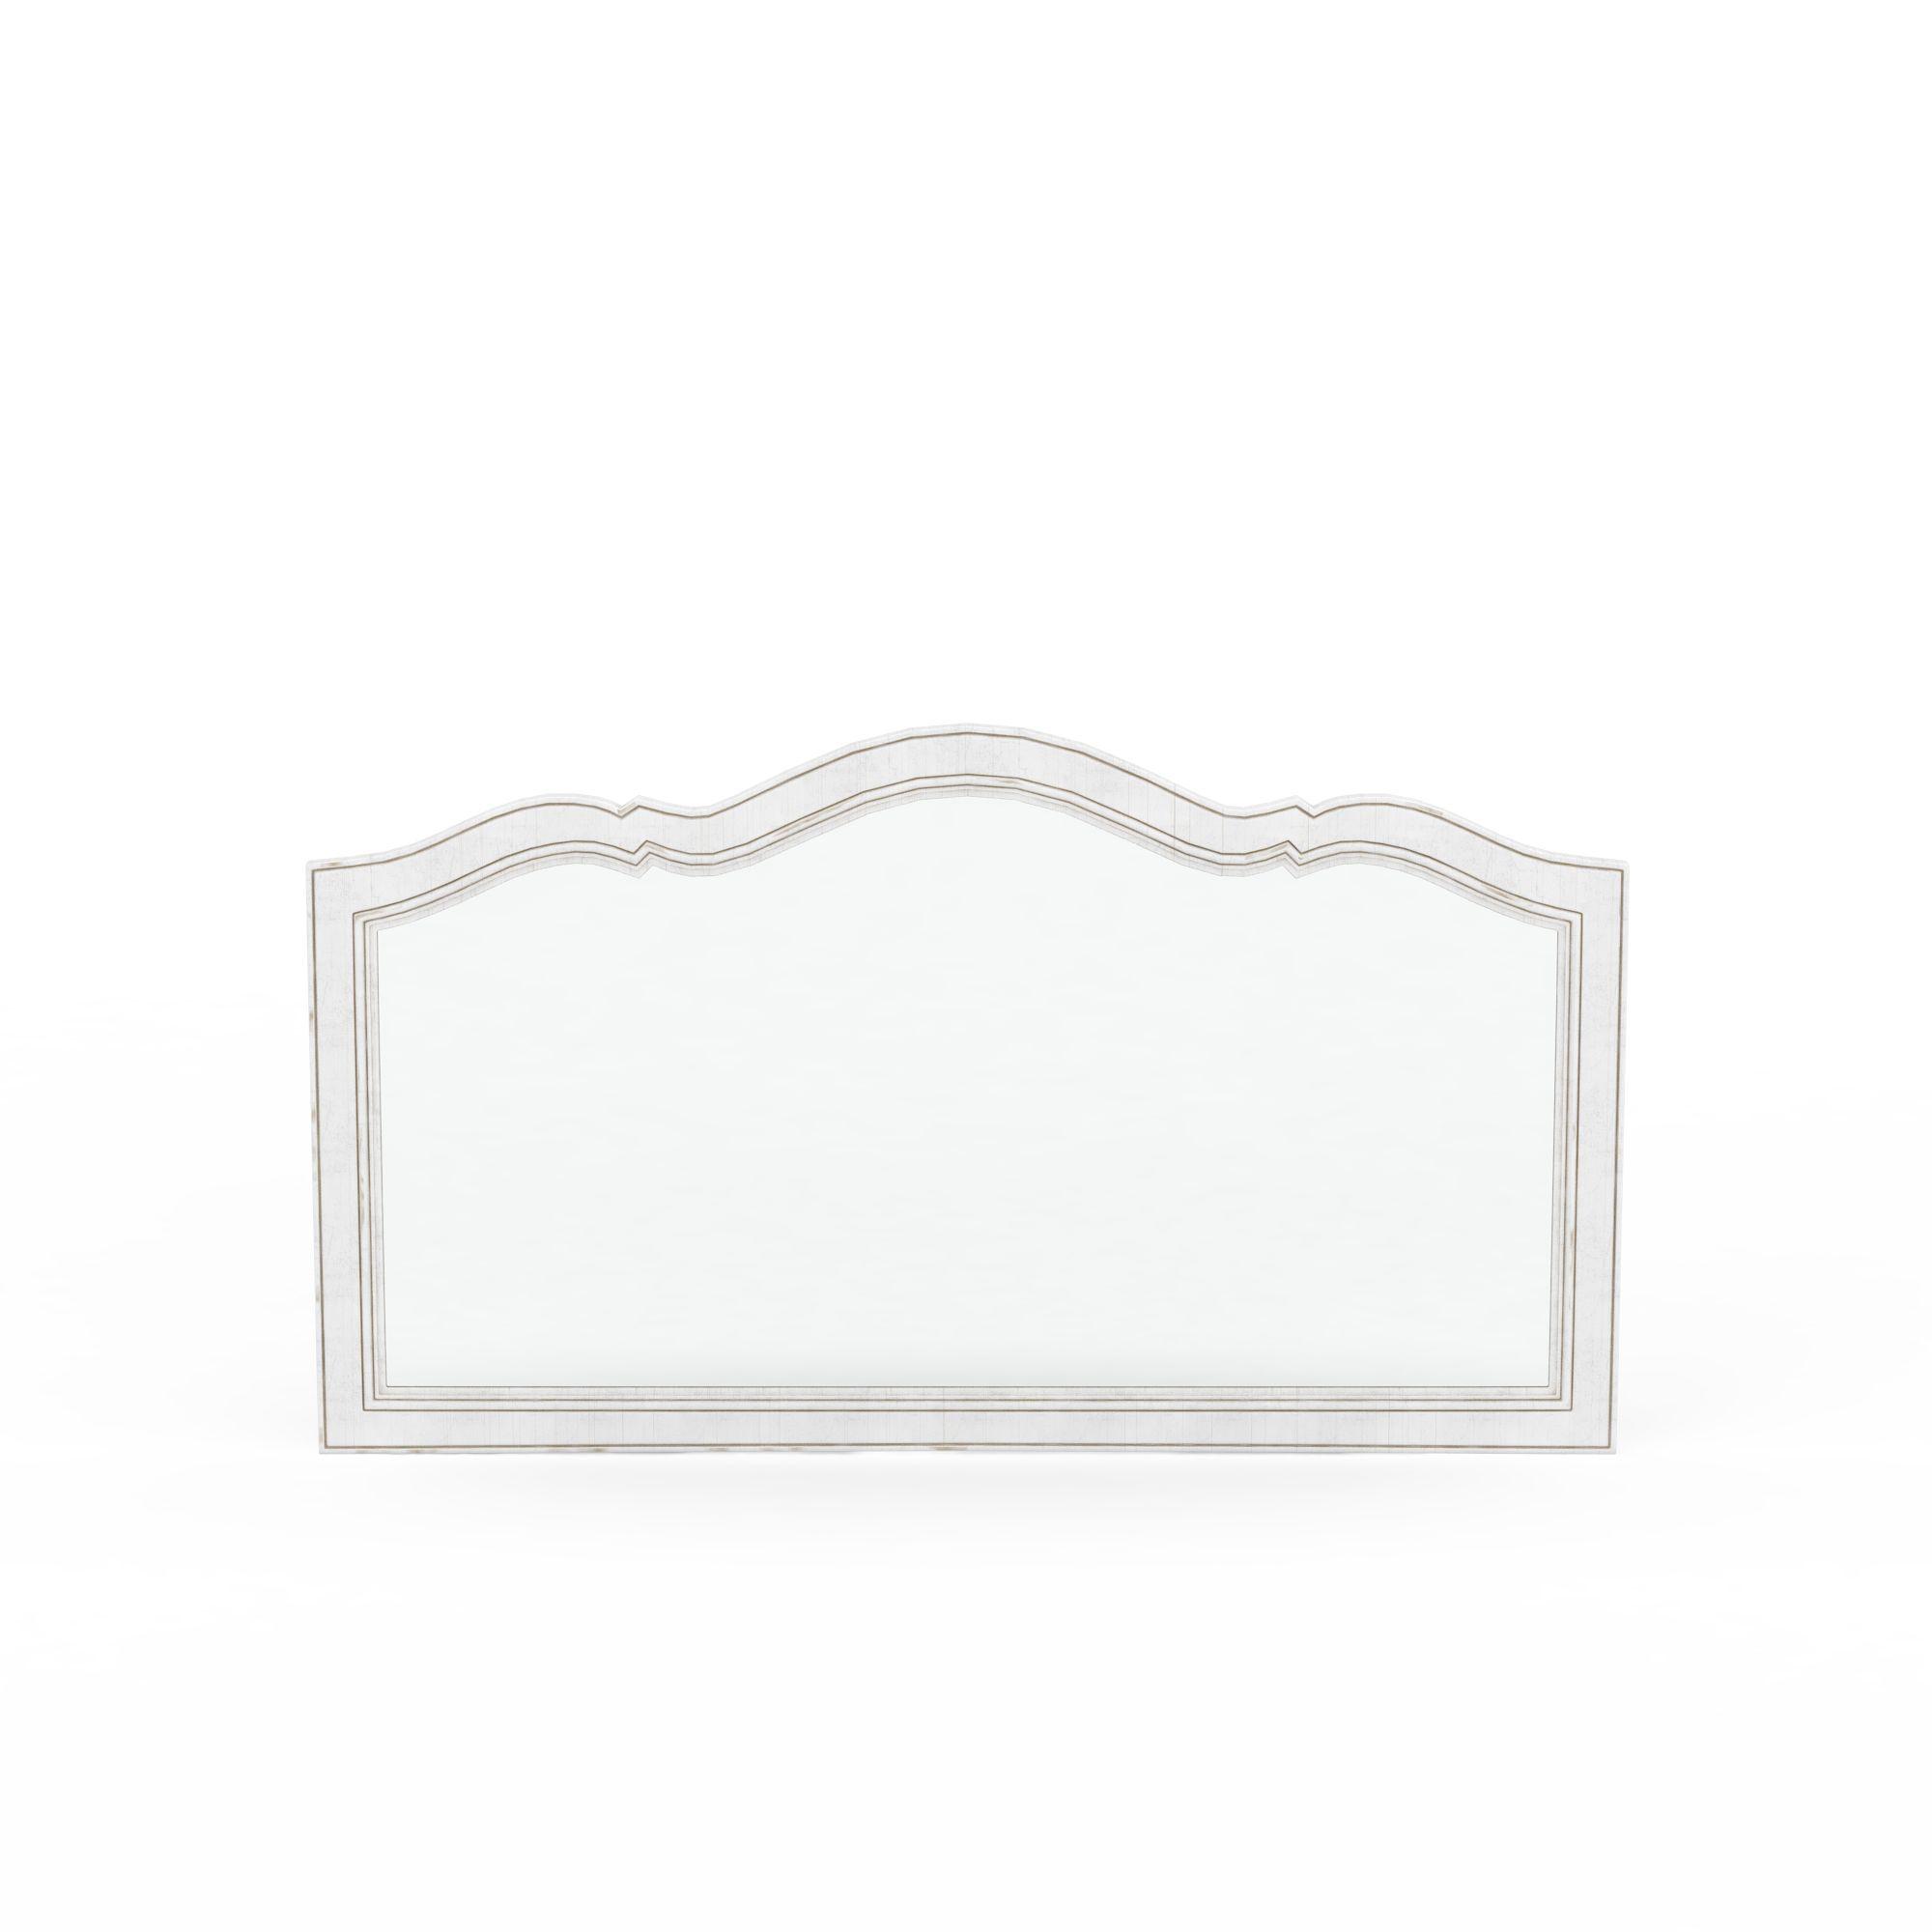 3d模型下载 日用饰品3d模型 陈设品 欧式简约画框3d模型 欧式简约画框